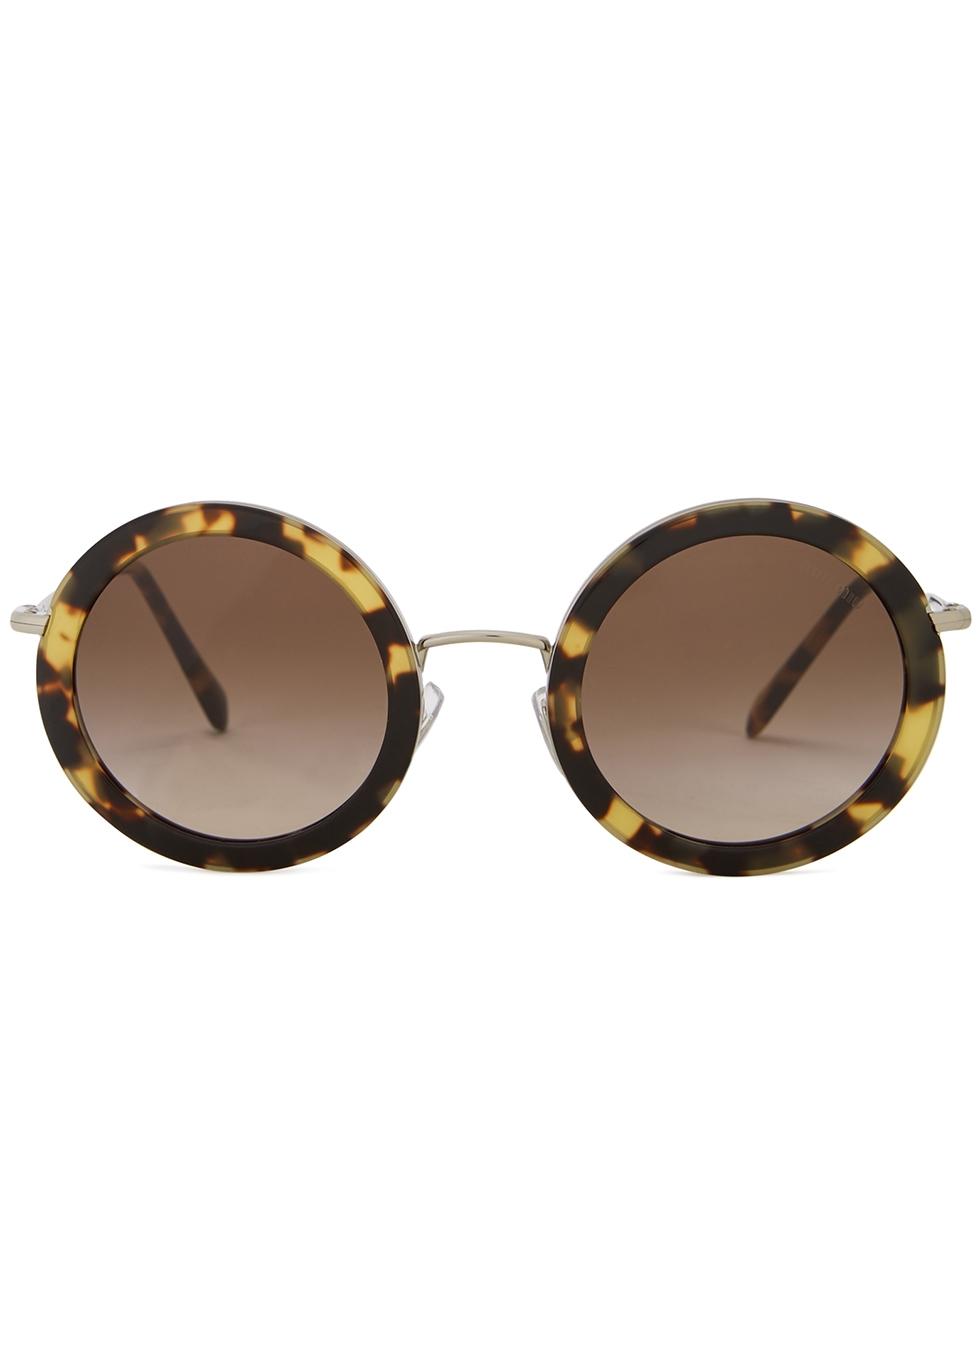 Tortoiseshell round-frame sunglasses - Miu Miu